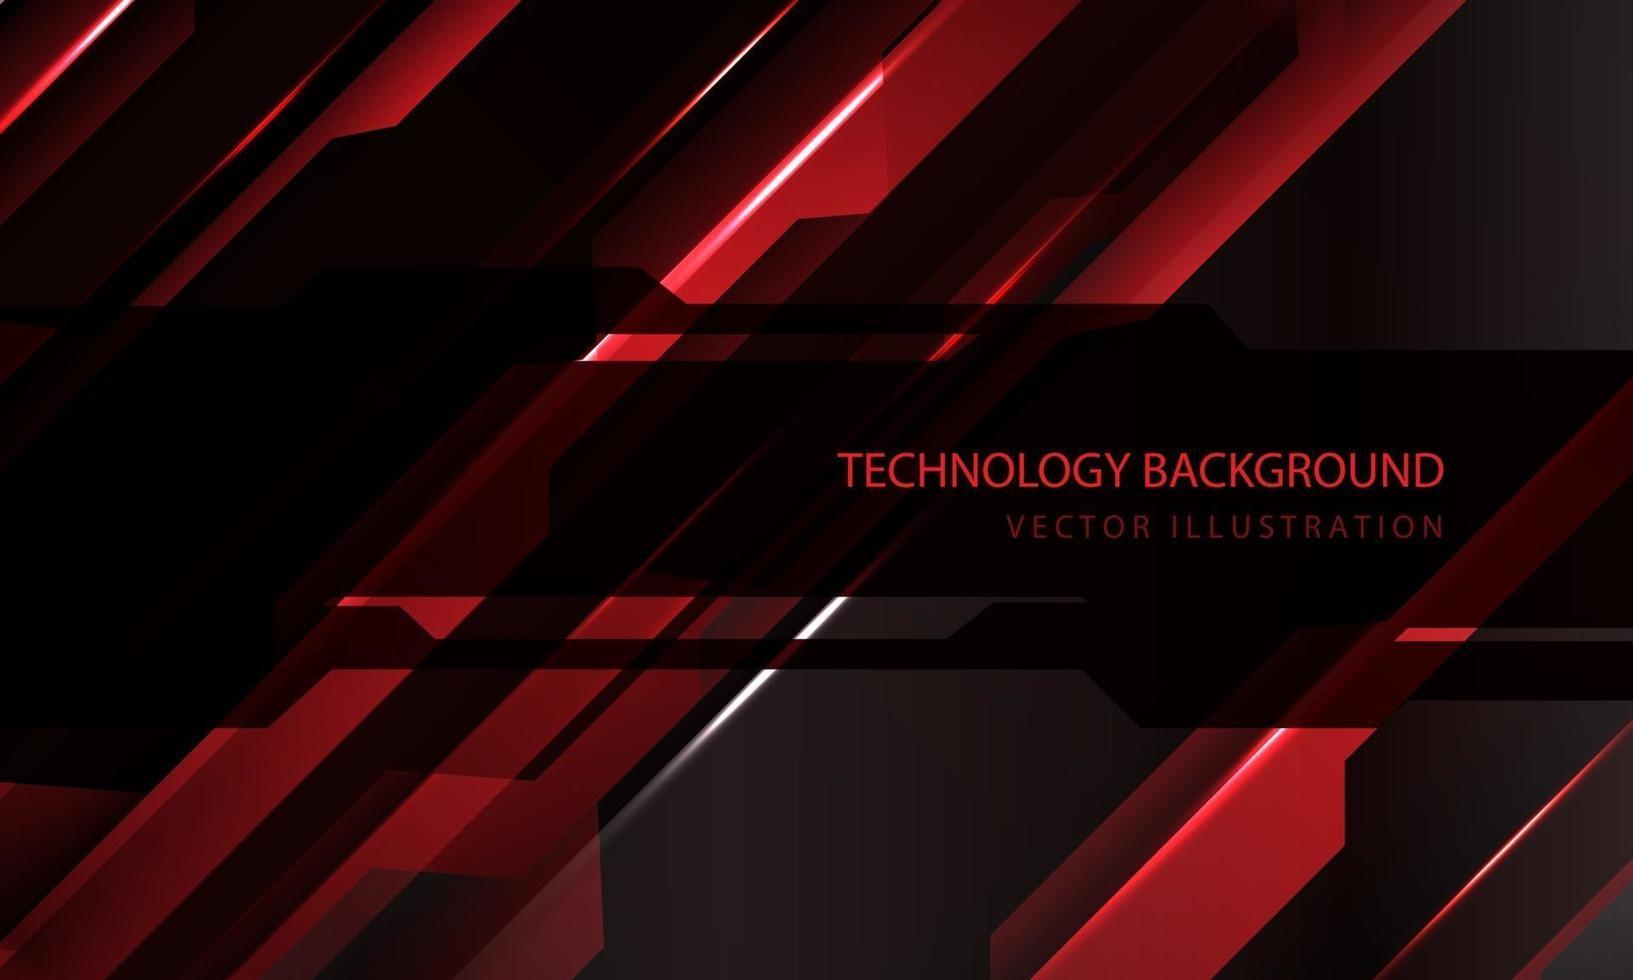 abstract technologie cyber circuit rood zwart metallic schuine streep snelheid donker banner transparantie overlapping ontwerp moderne futuristische achtergrond vectorillustratie. vector